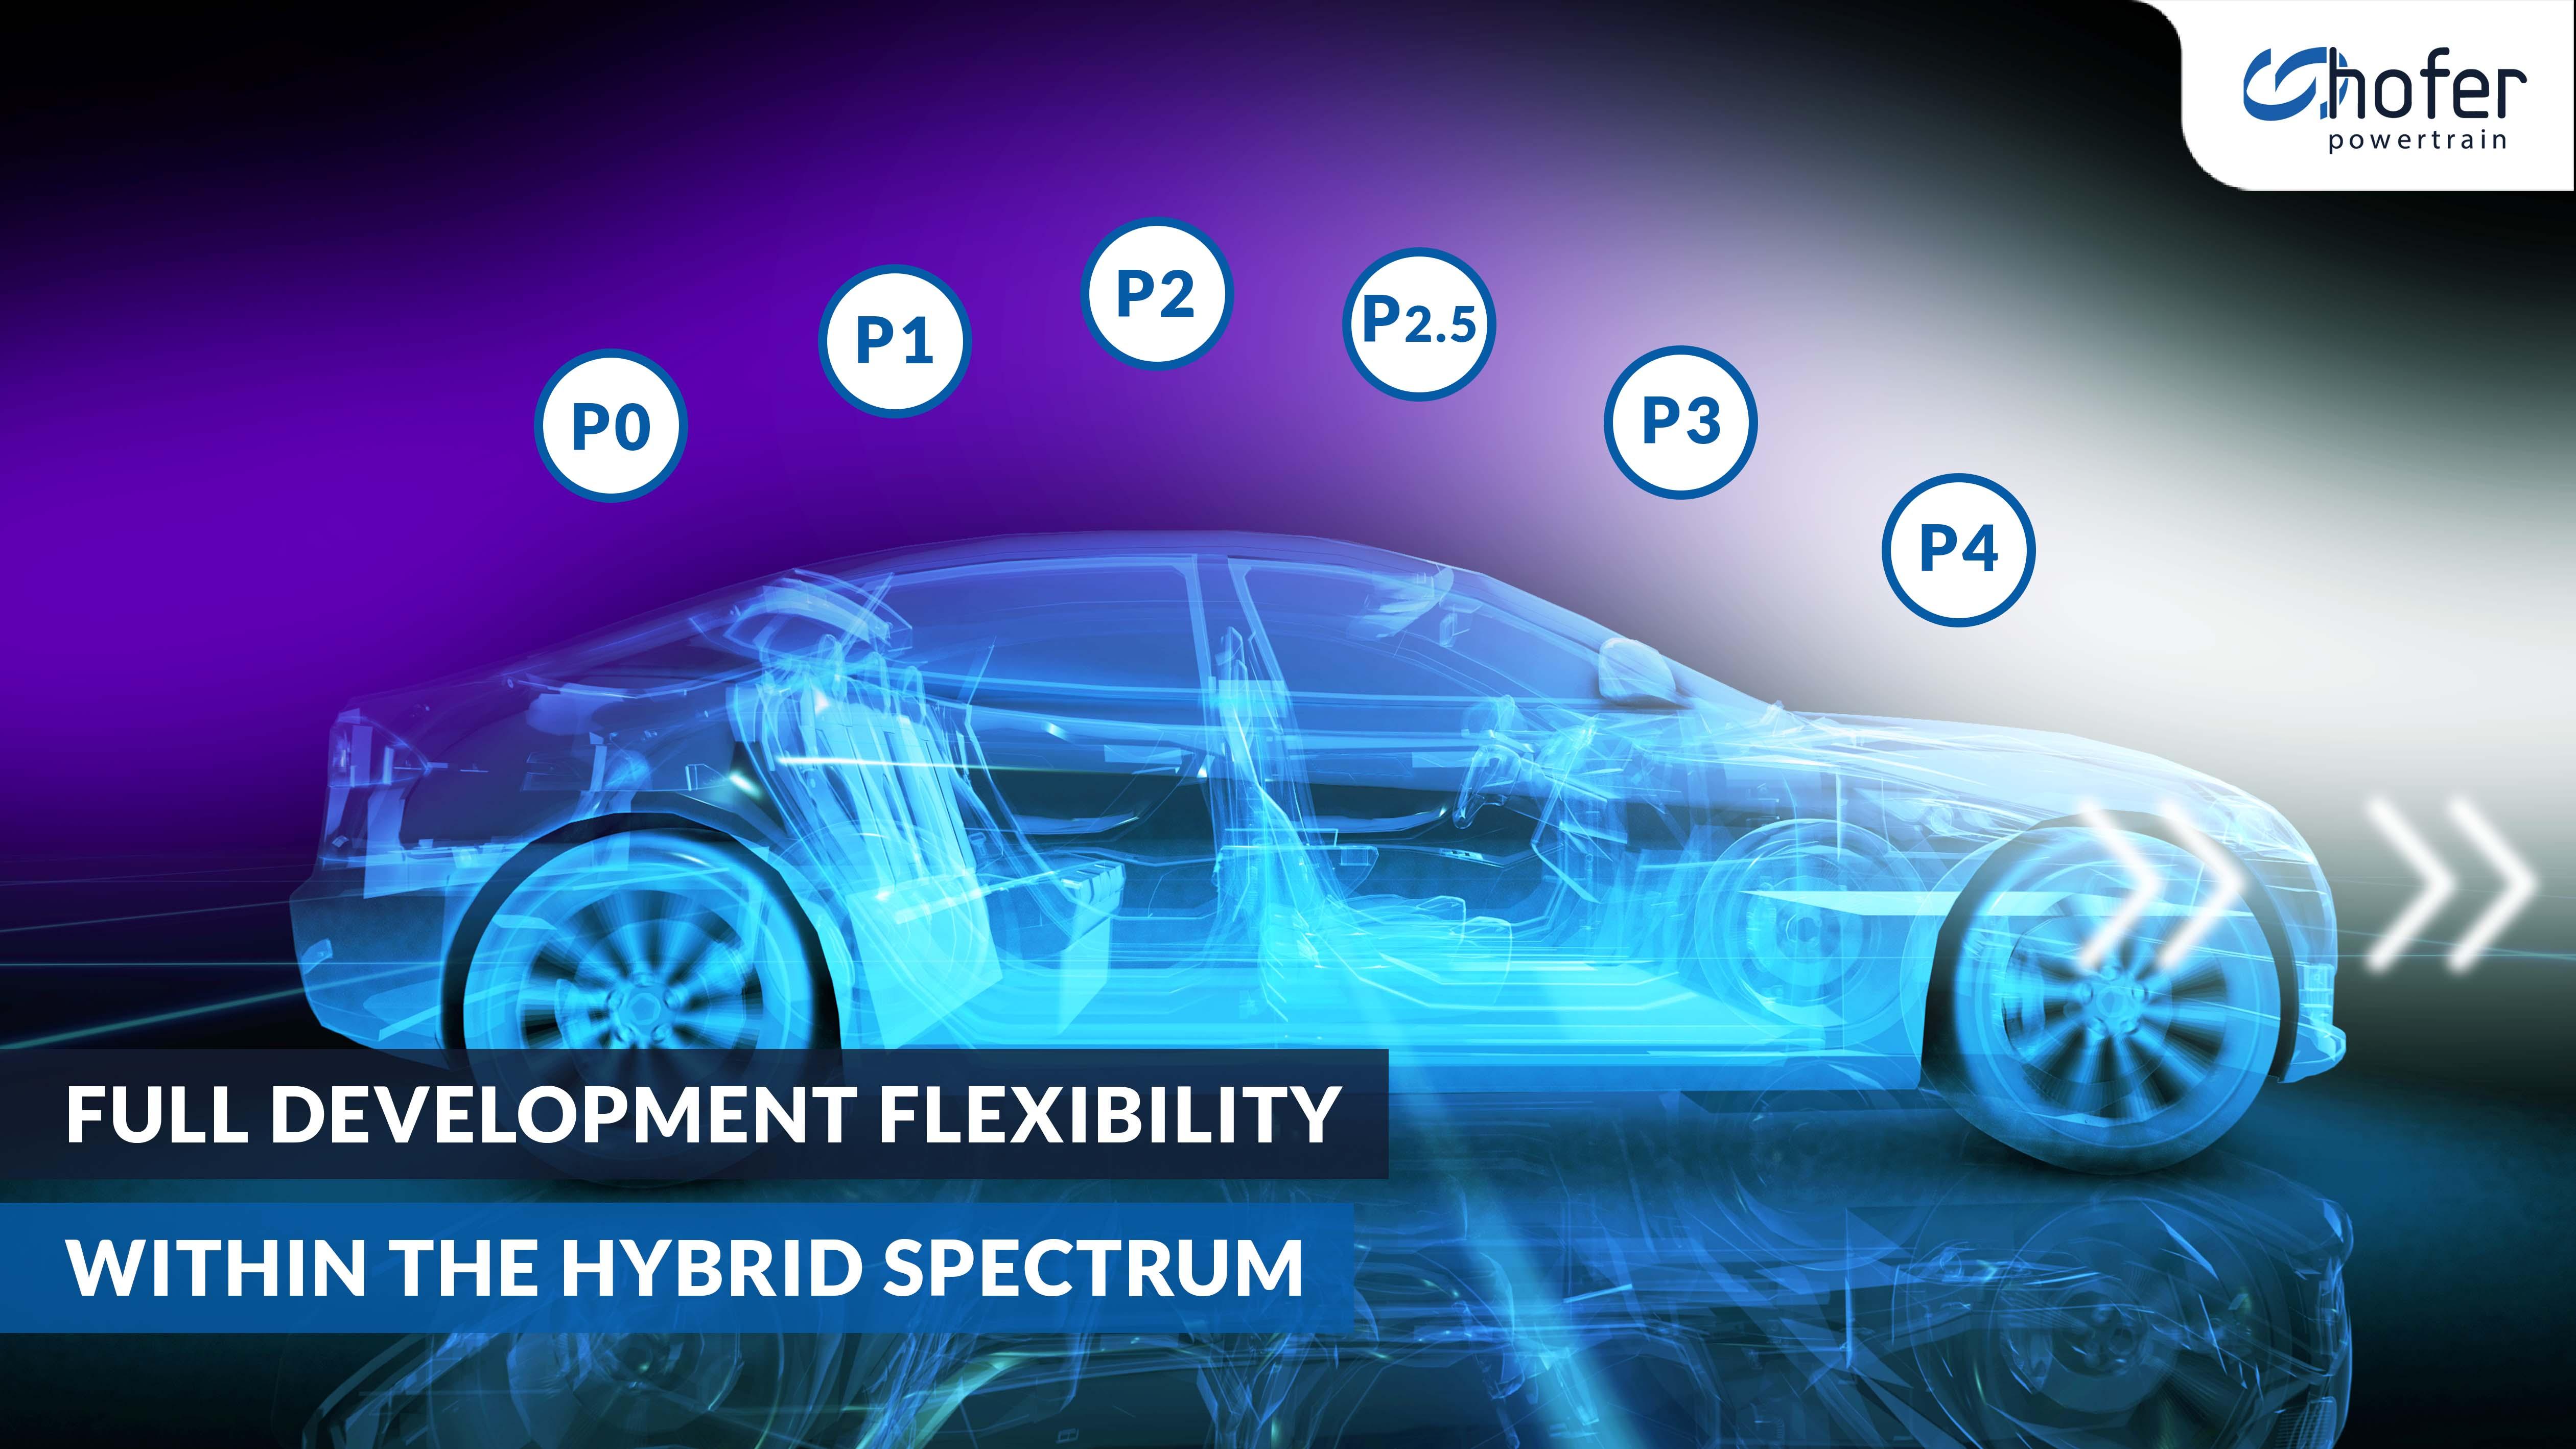 Full development flexibility within the hybrid powertrain spectrum